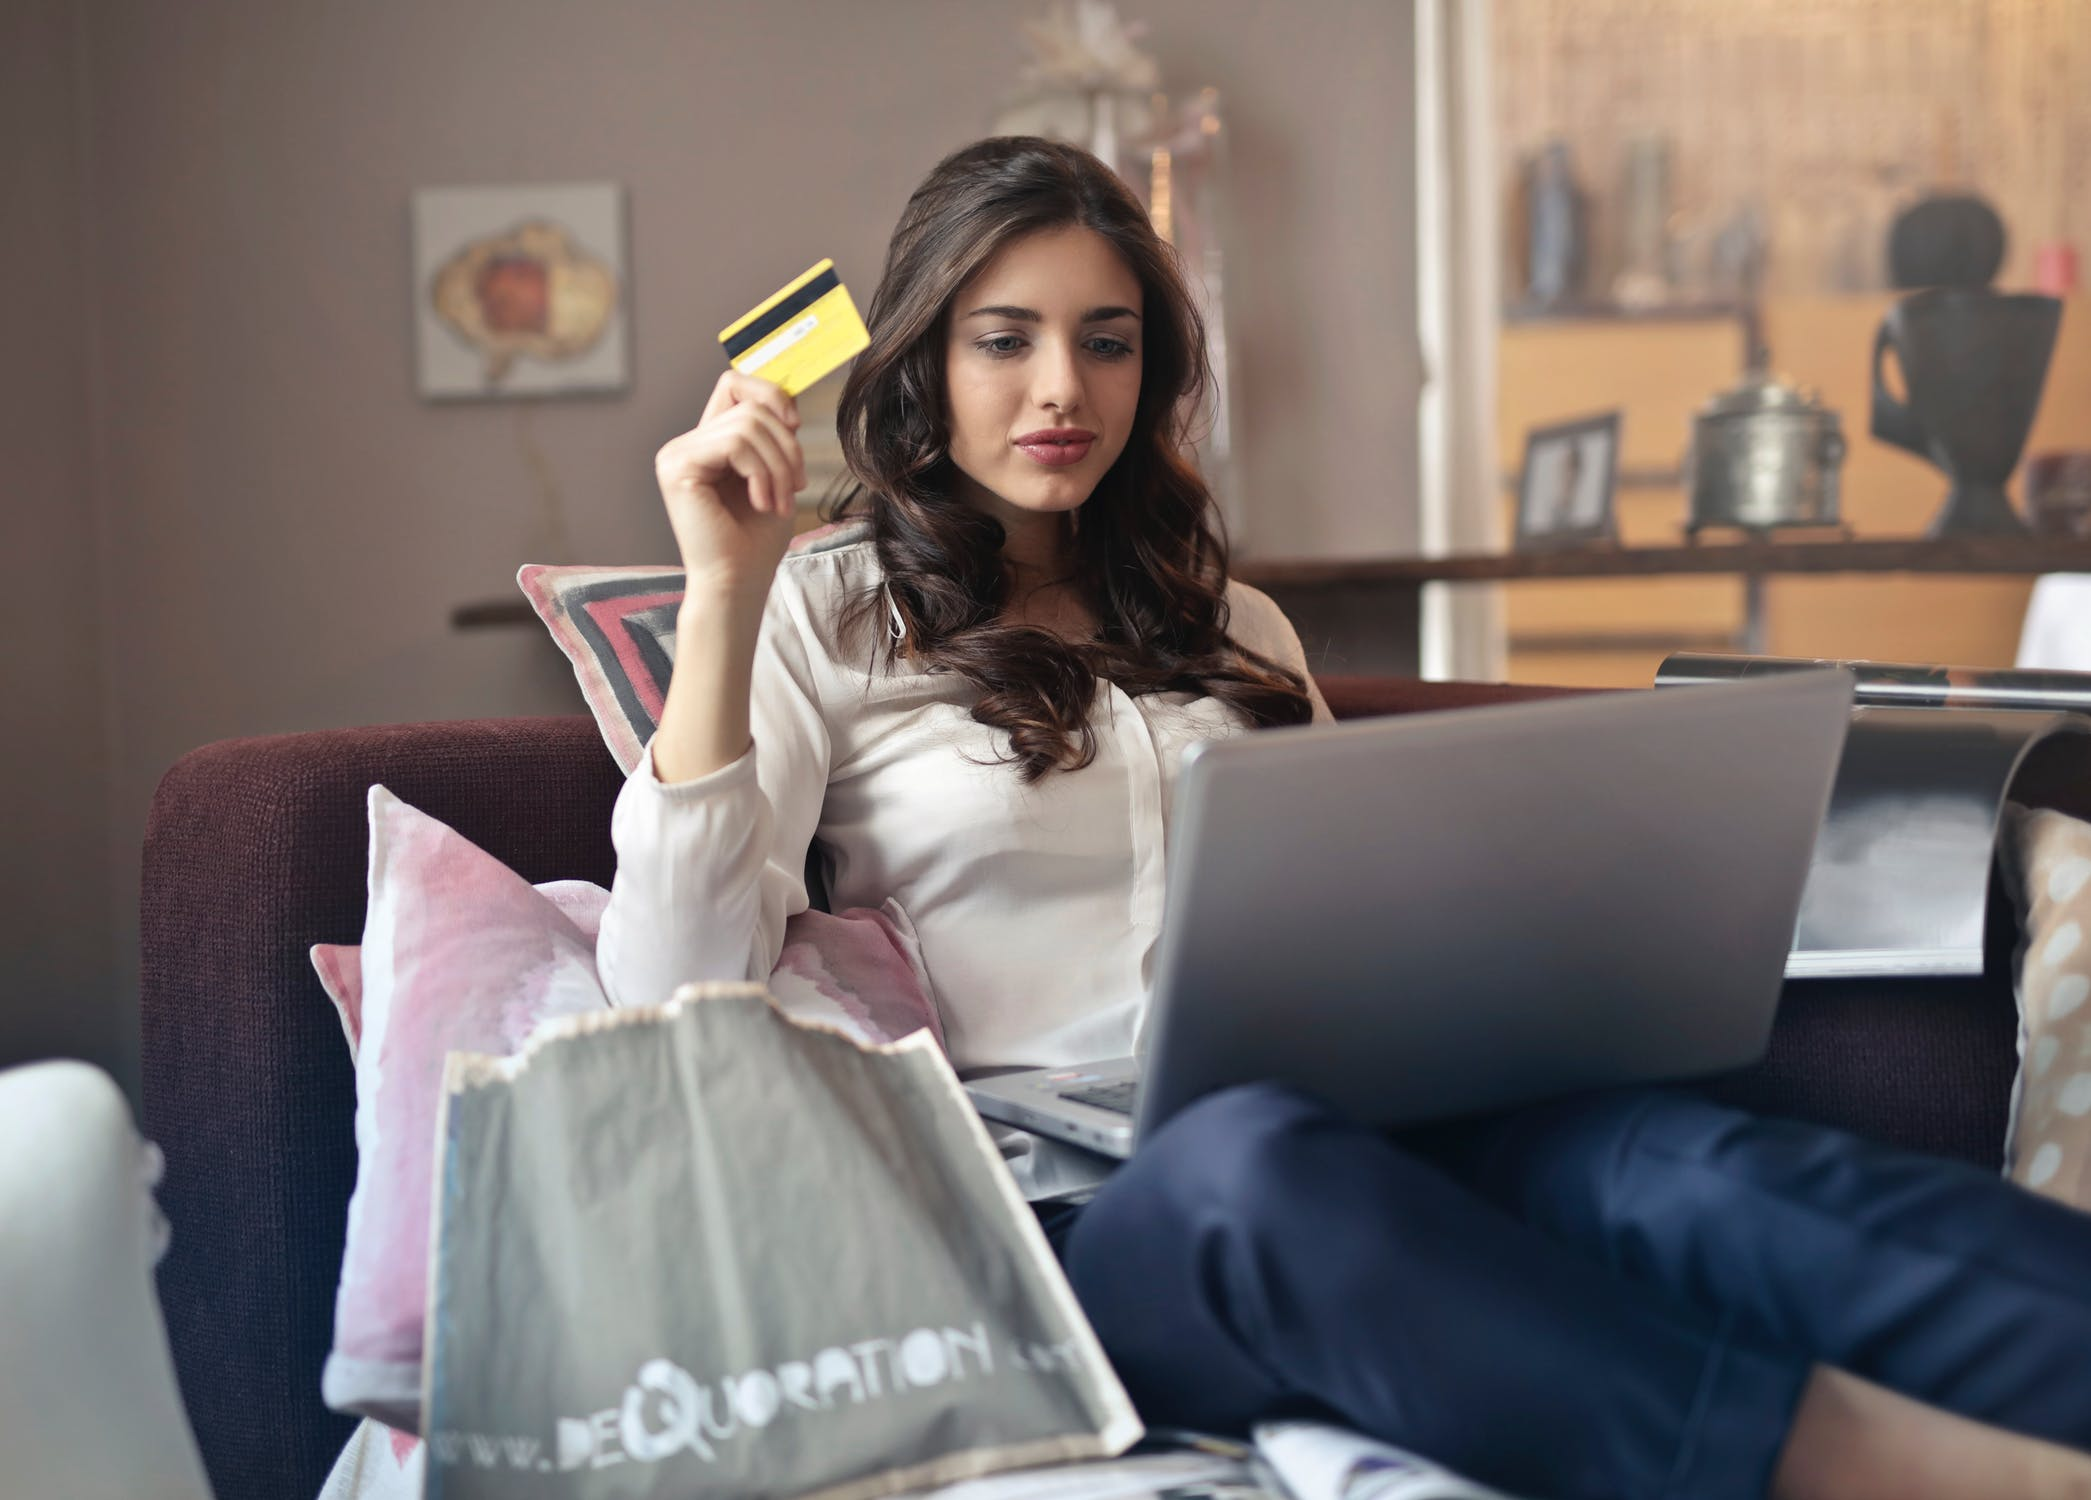 50 Amazing Online Shopping and Ecommerce Statistics